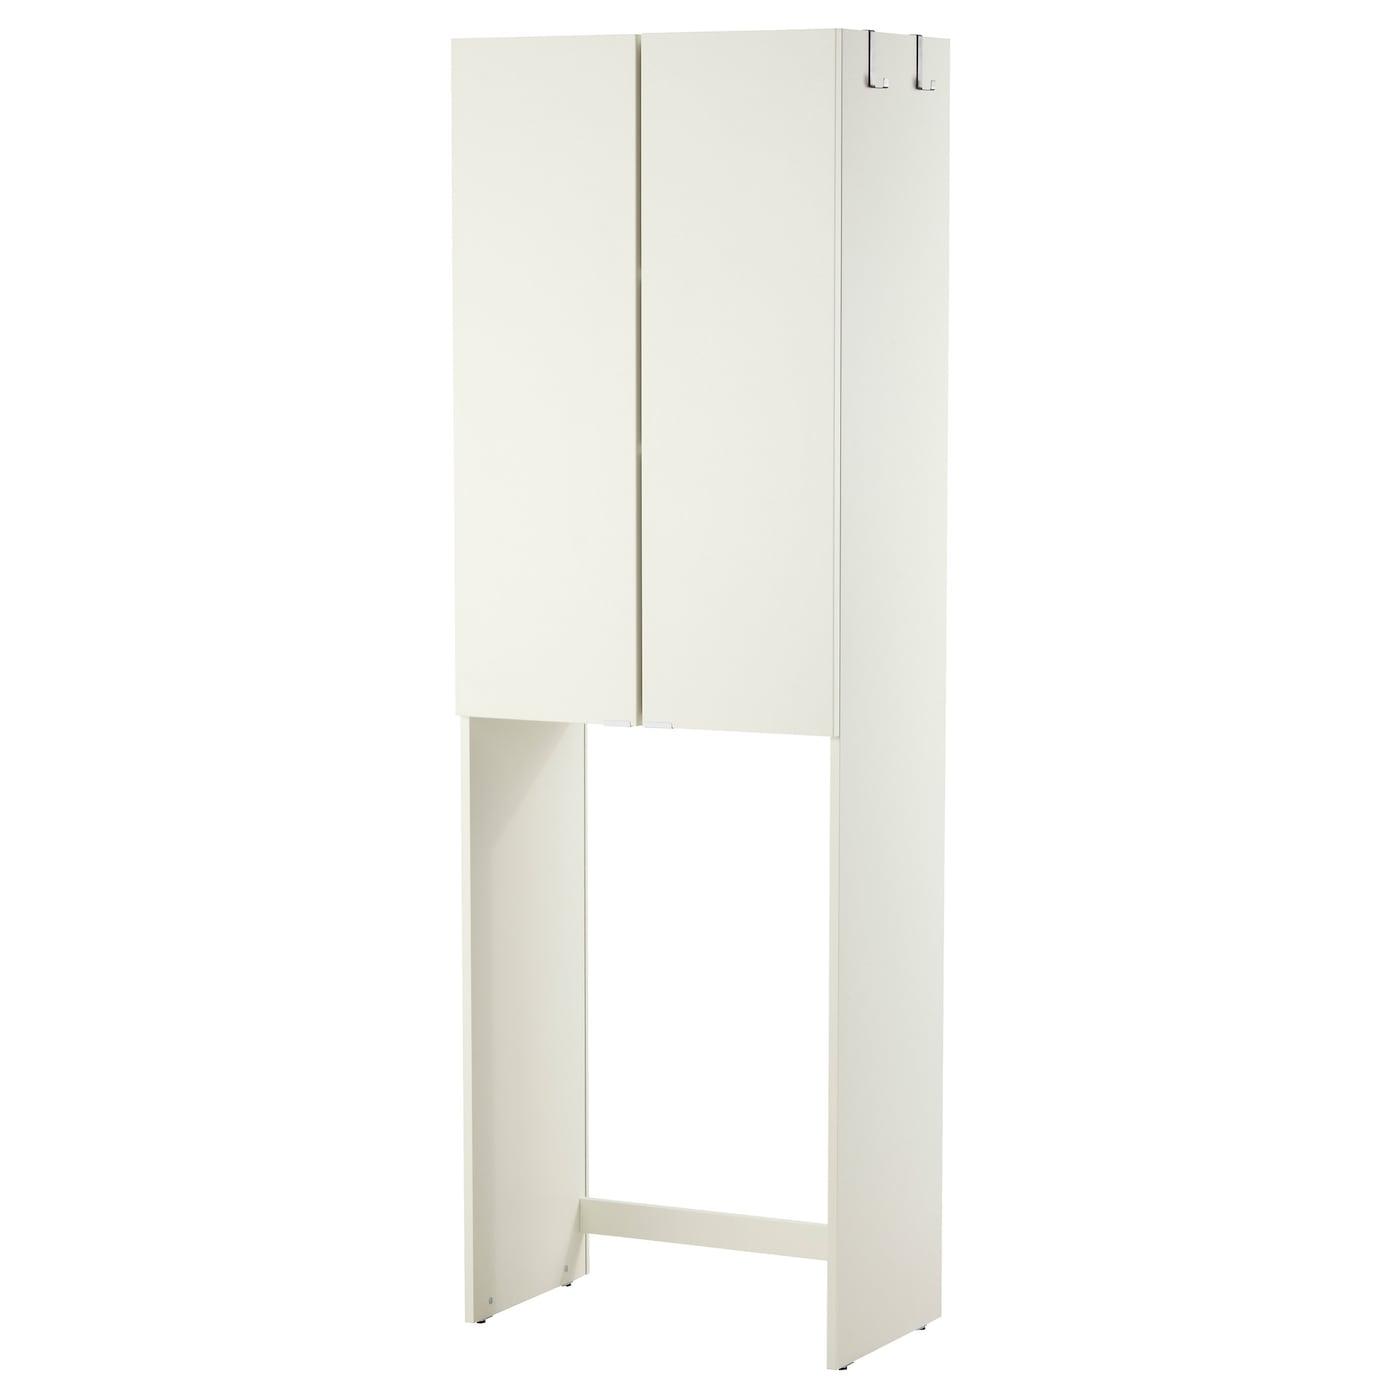 Lillangen Waschmaschinenschrank Weiss Ikea Deutschland